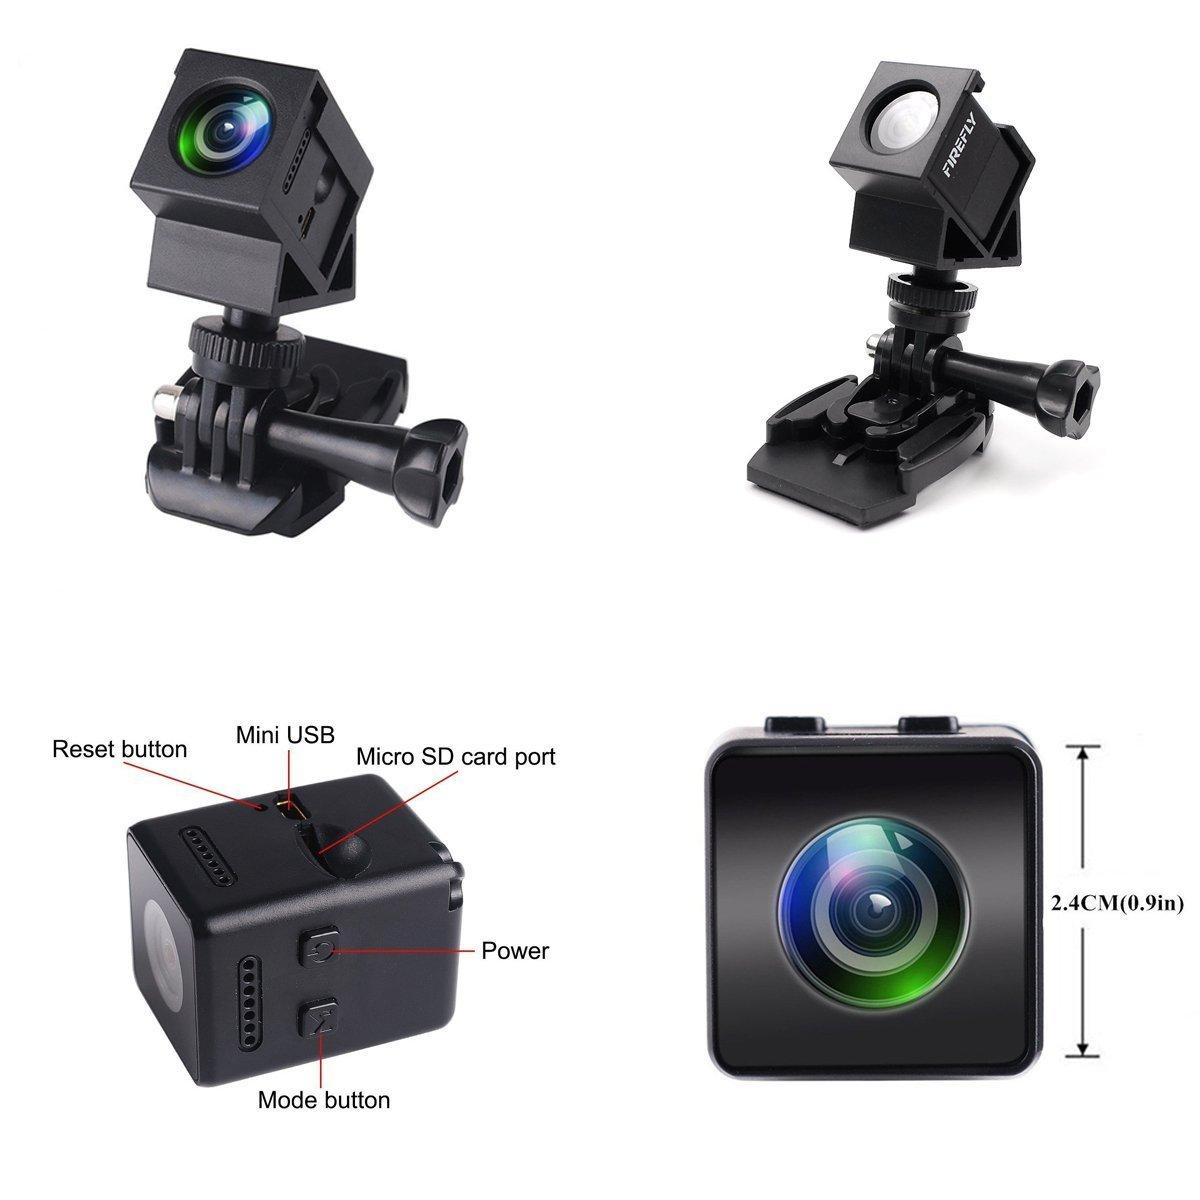 Mini cámara Hawkeye Firefly HD 1080P FPV Micro cámara de acción Mini cámara oculta SPY con DVR FOV 160 ° micrófono incorporado para RC Drone: Amazon.es: ...